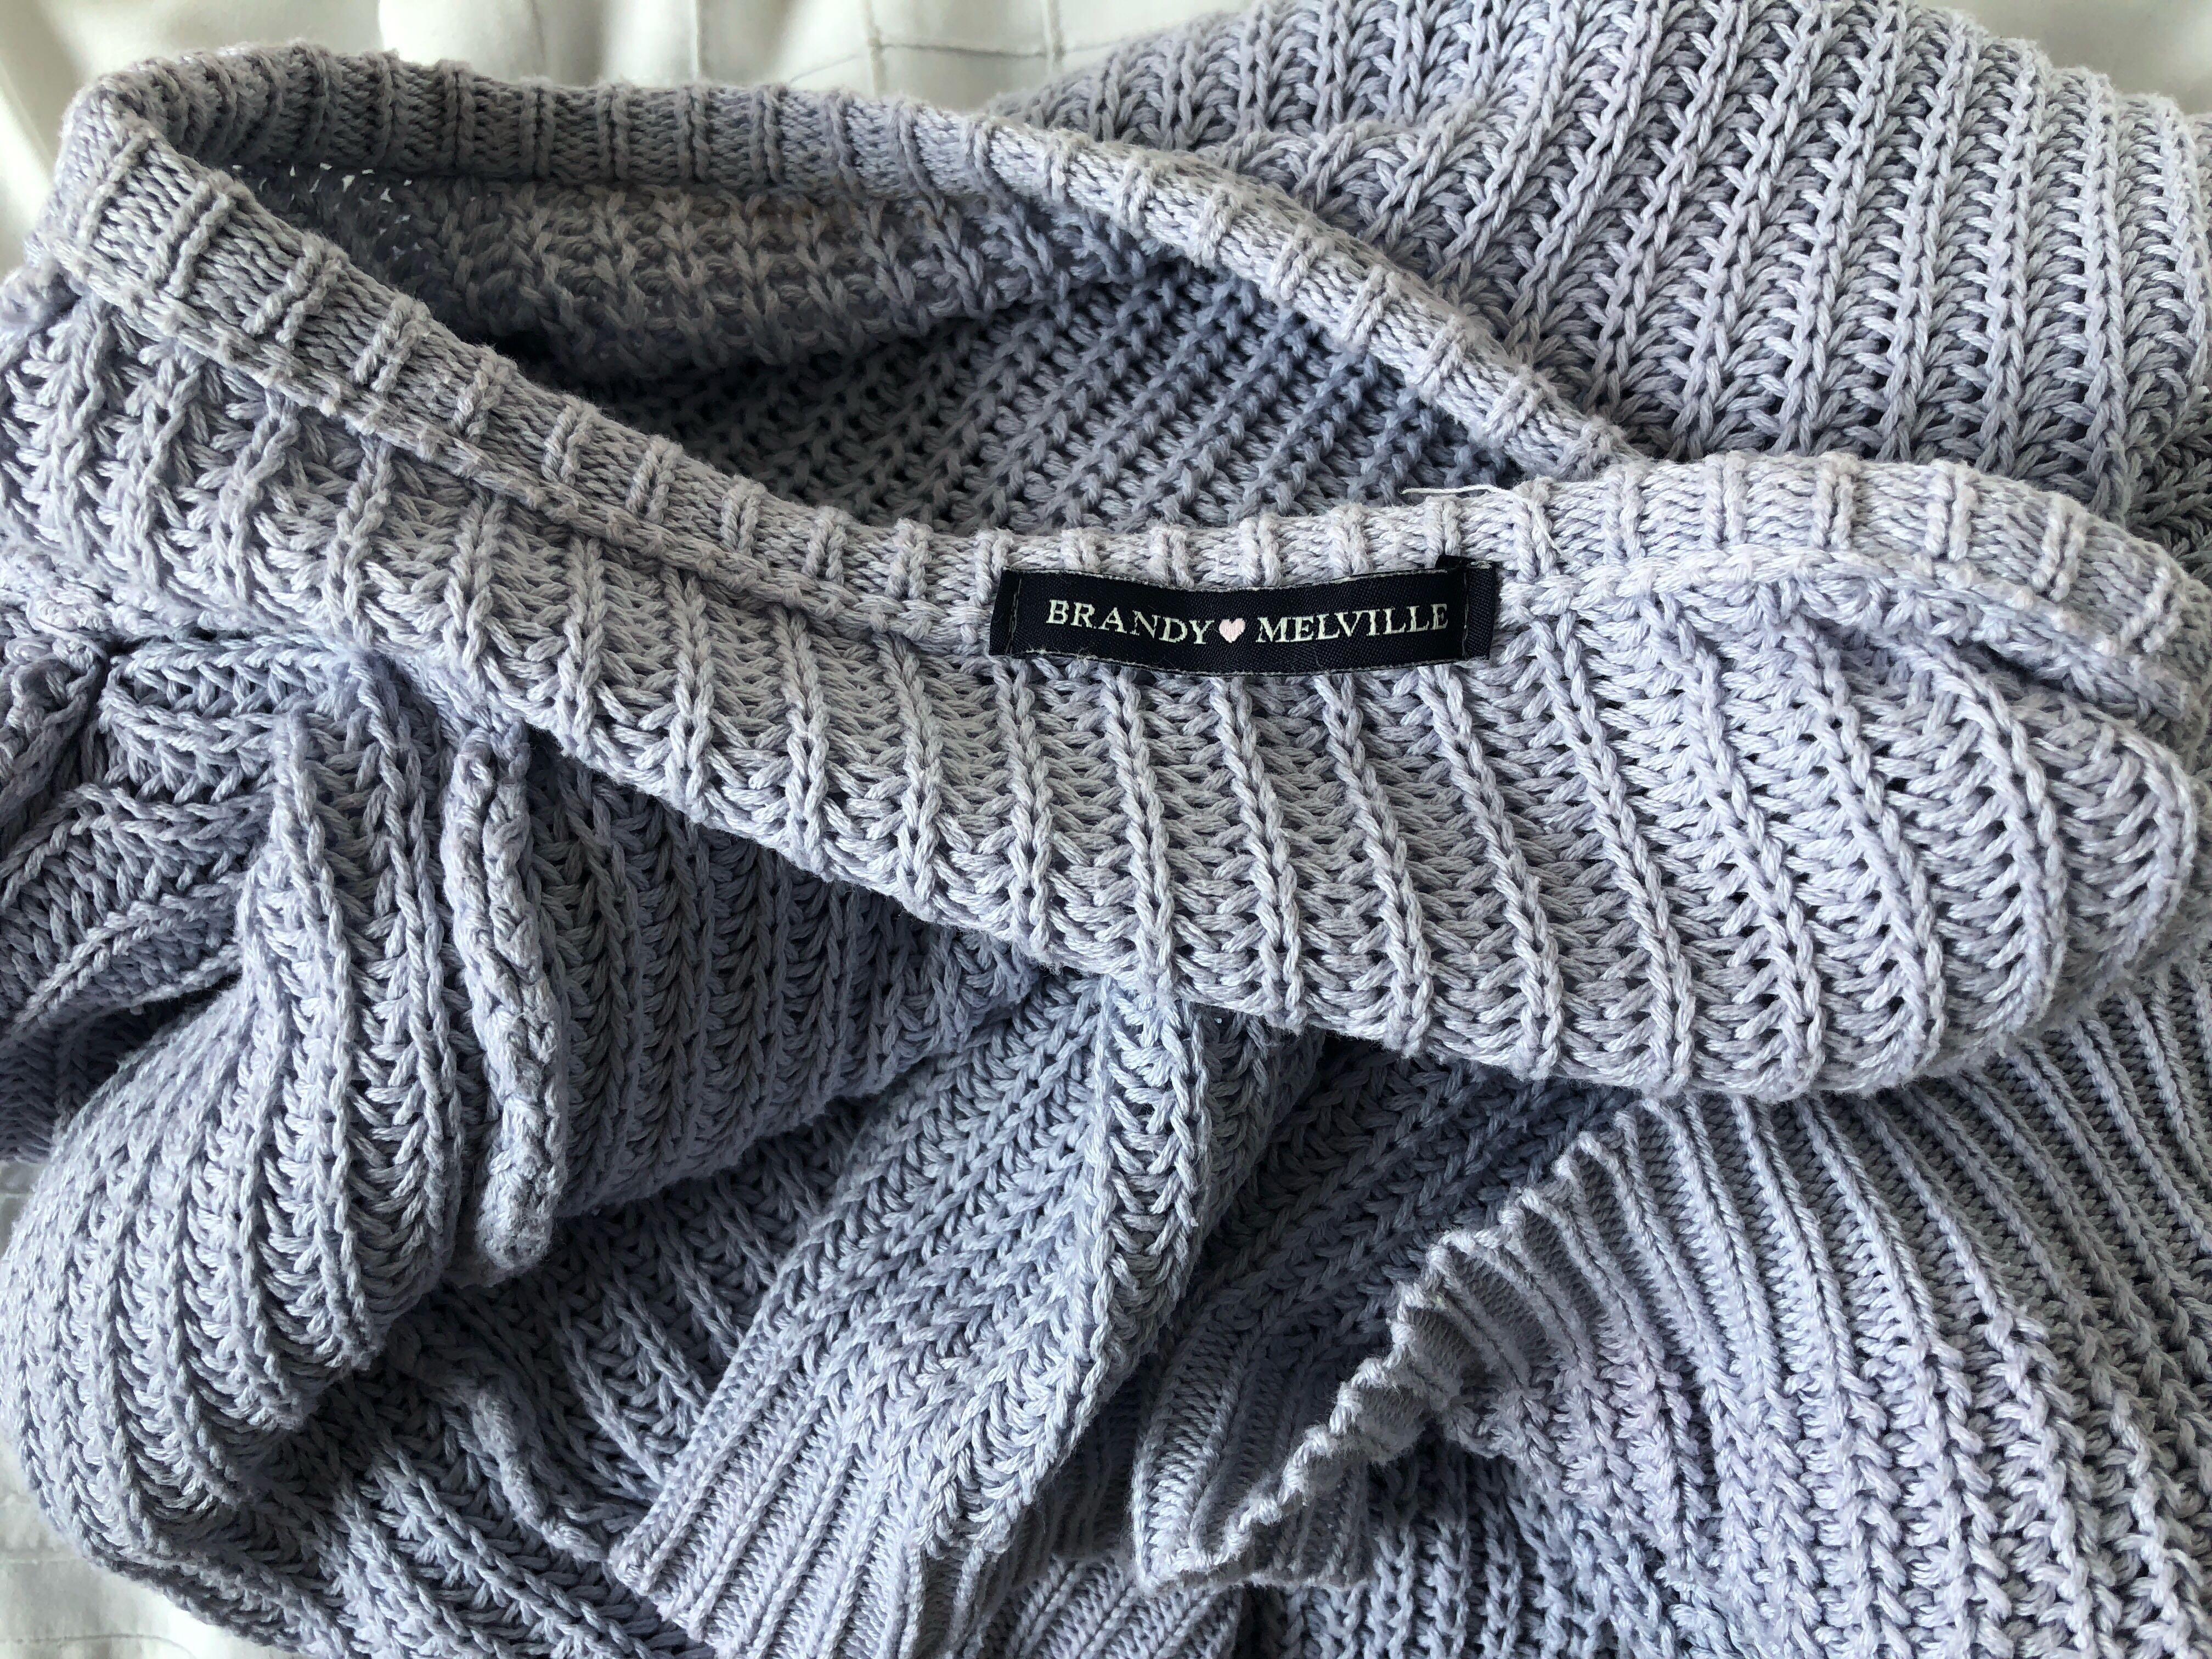 073166f11d2 Brandy Melville Ollie Sweater *RARE LILAC COLOUR*